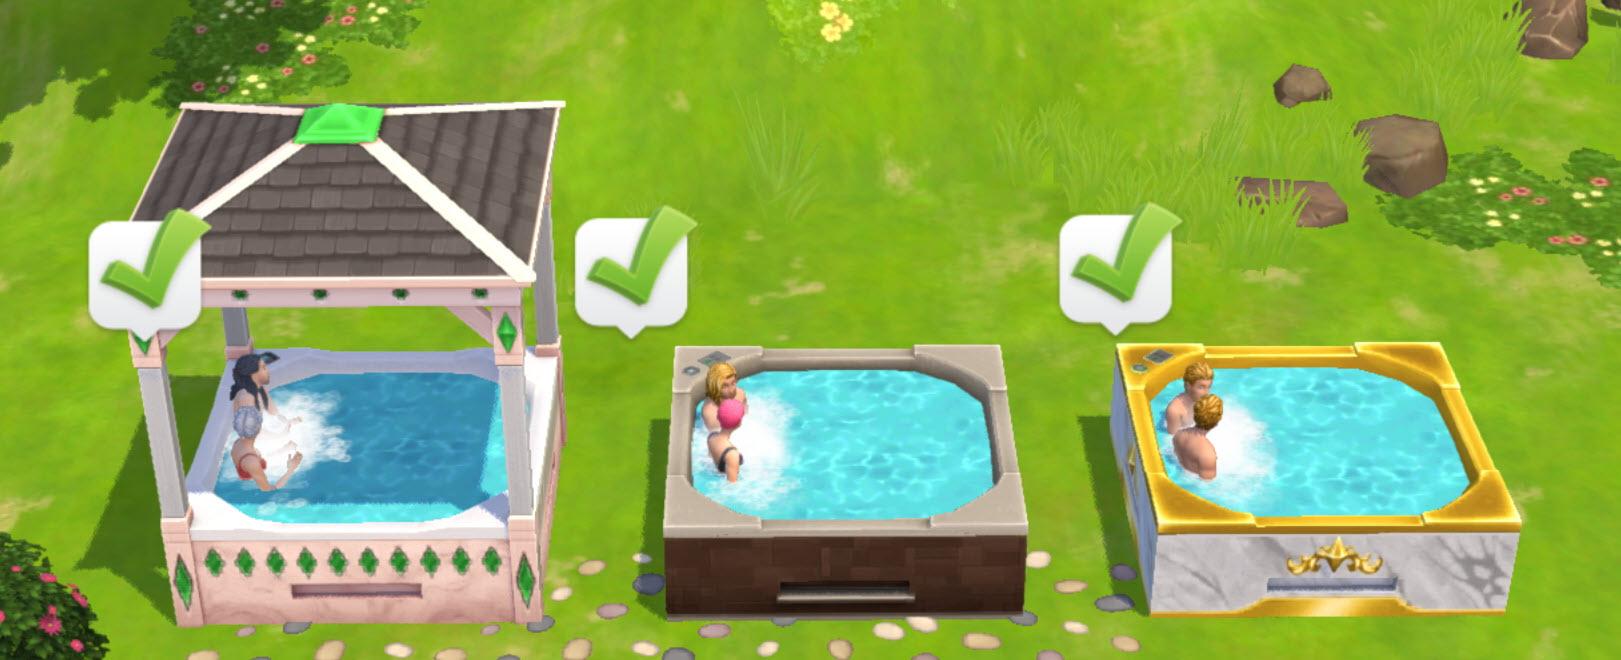 Los Sims_2020-07-19-14-31-02.jpg